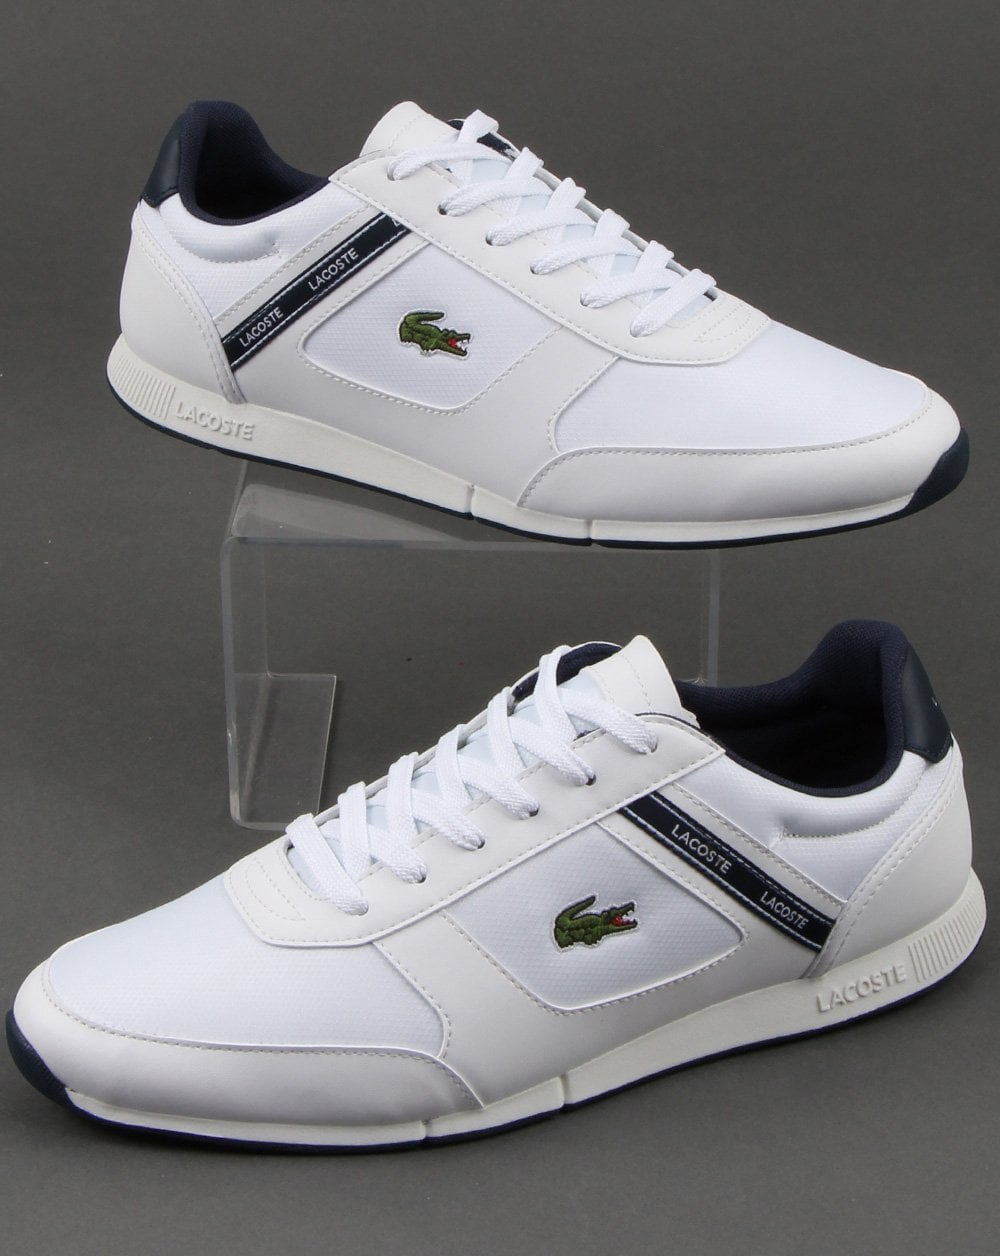 c6f8834e1 Lacoste Lacoste Footwear Menerva Trainer White navy